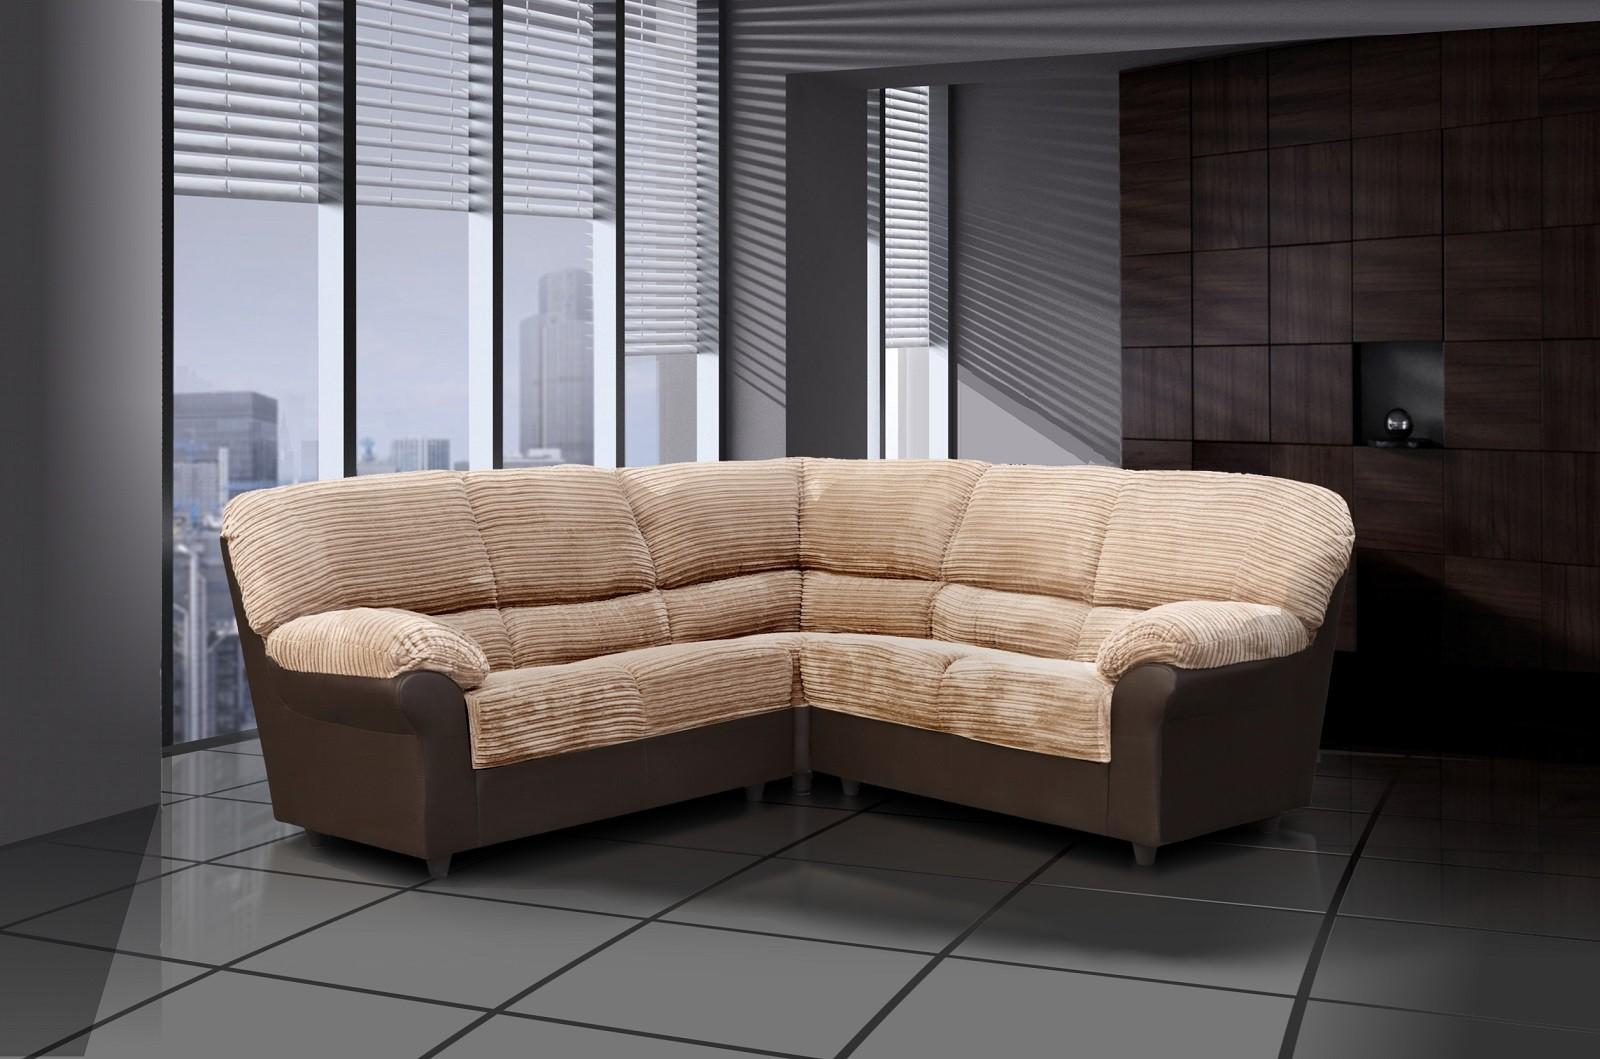 Candy Corner Sofa in Brown/Cream Fabric